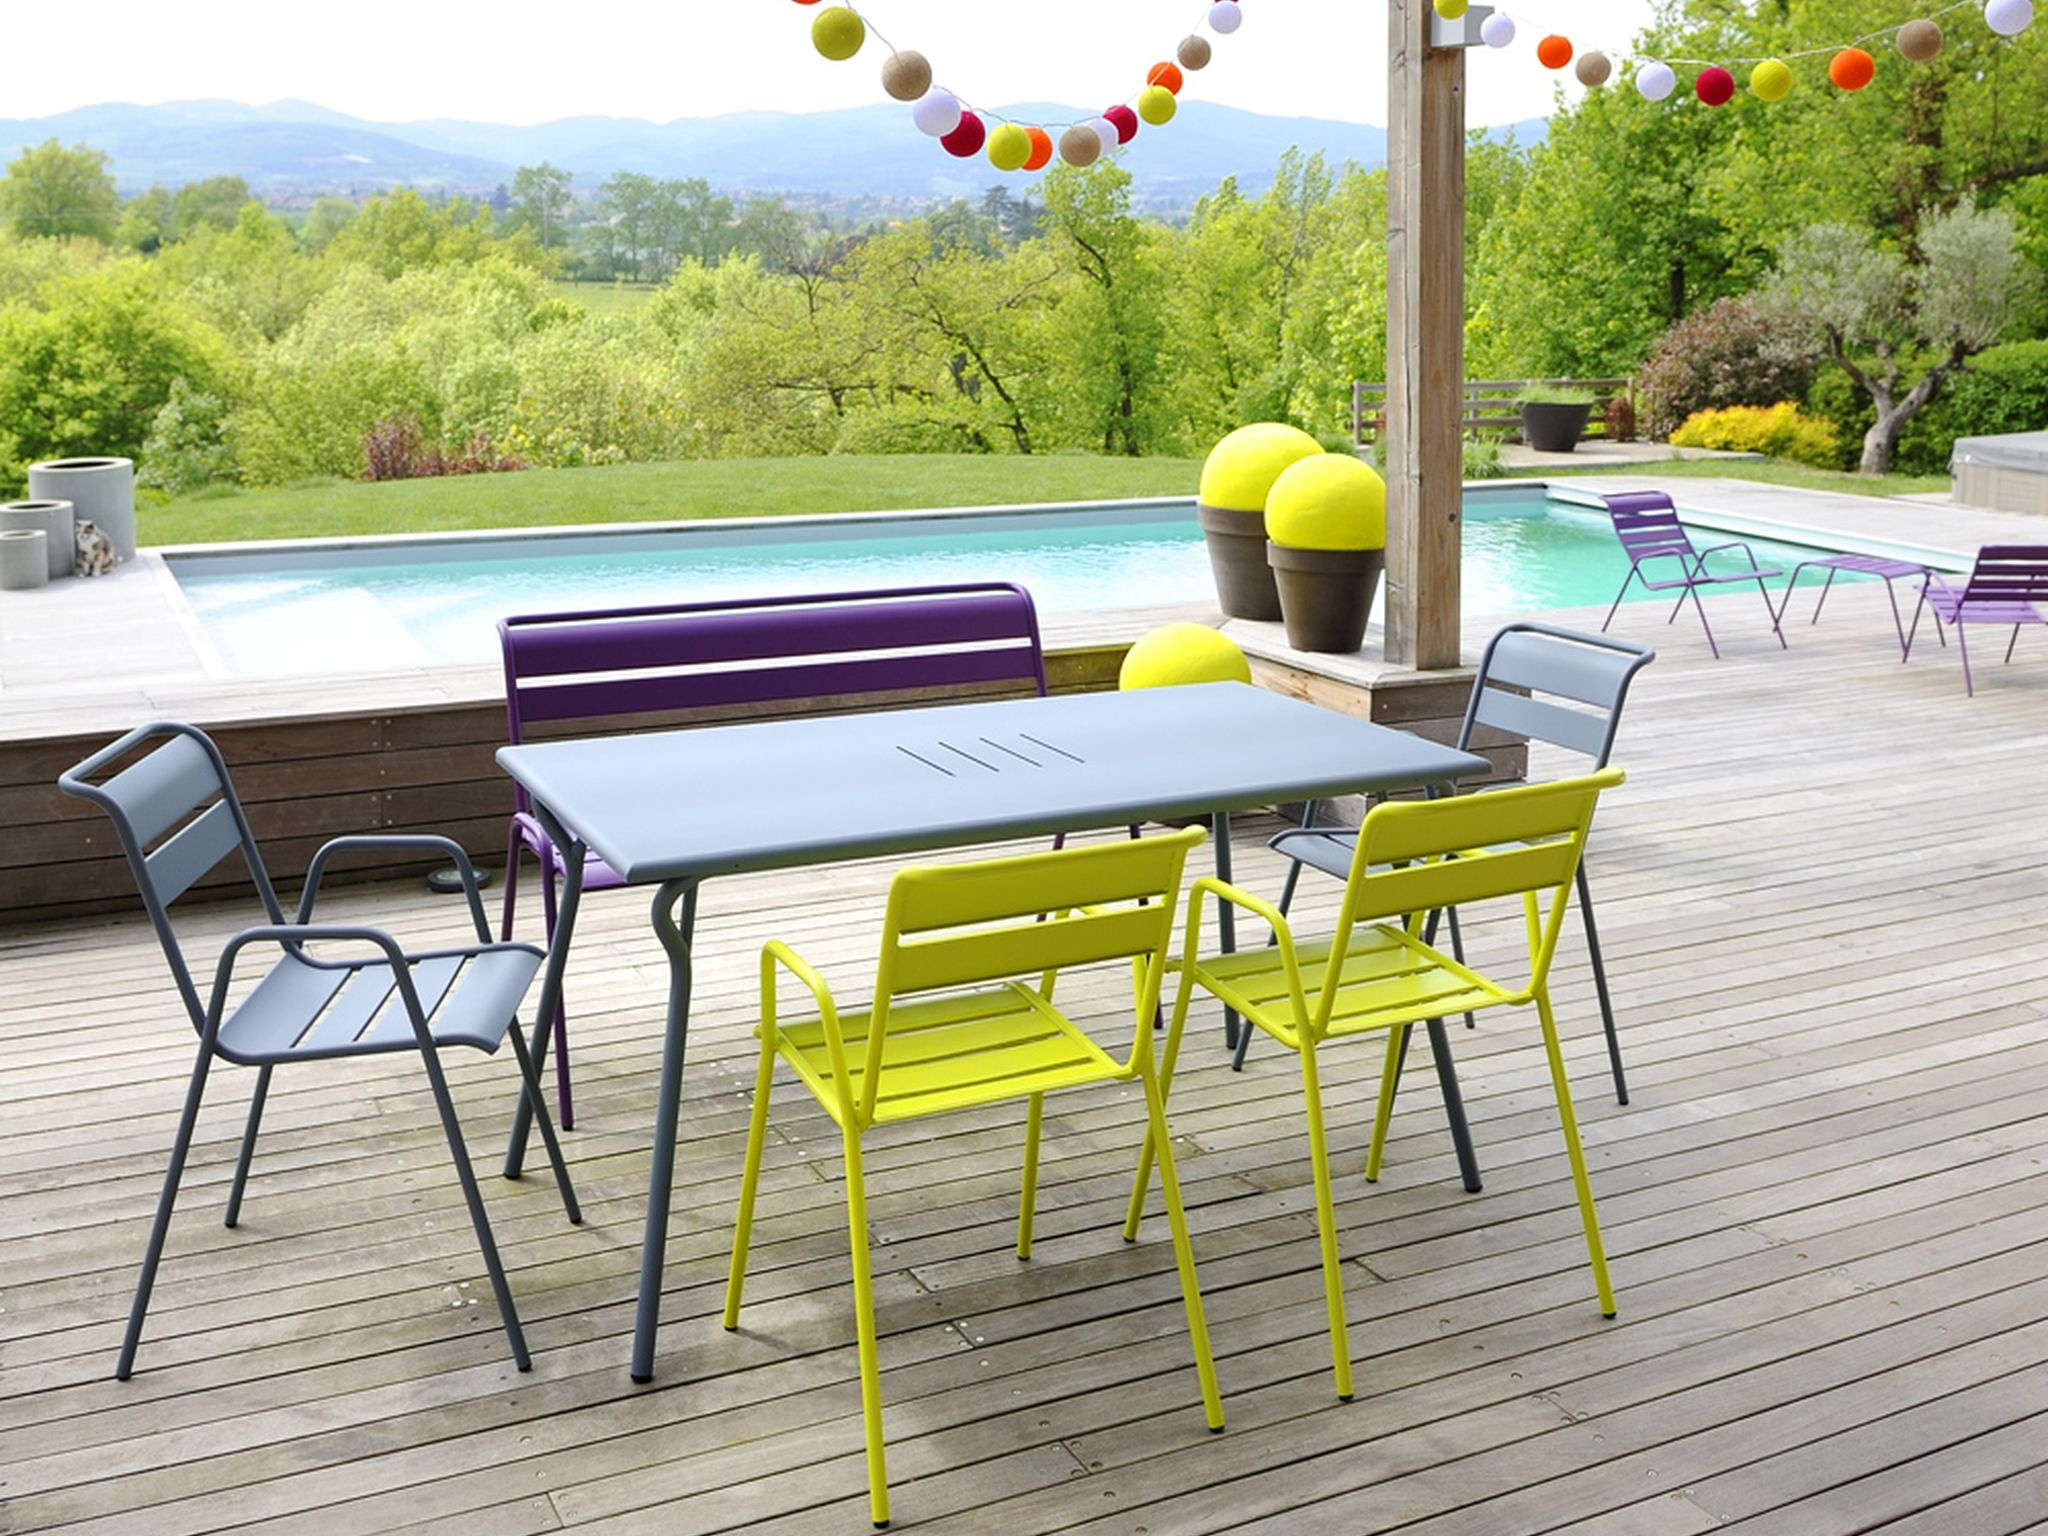 Mobilier De Jardin Style Fermob - Mailleraye.fr Jardin destiné Table Fermob Cargo Soldes